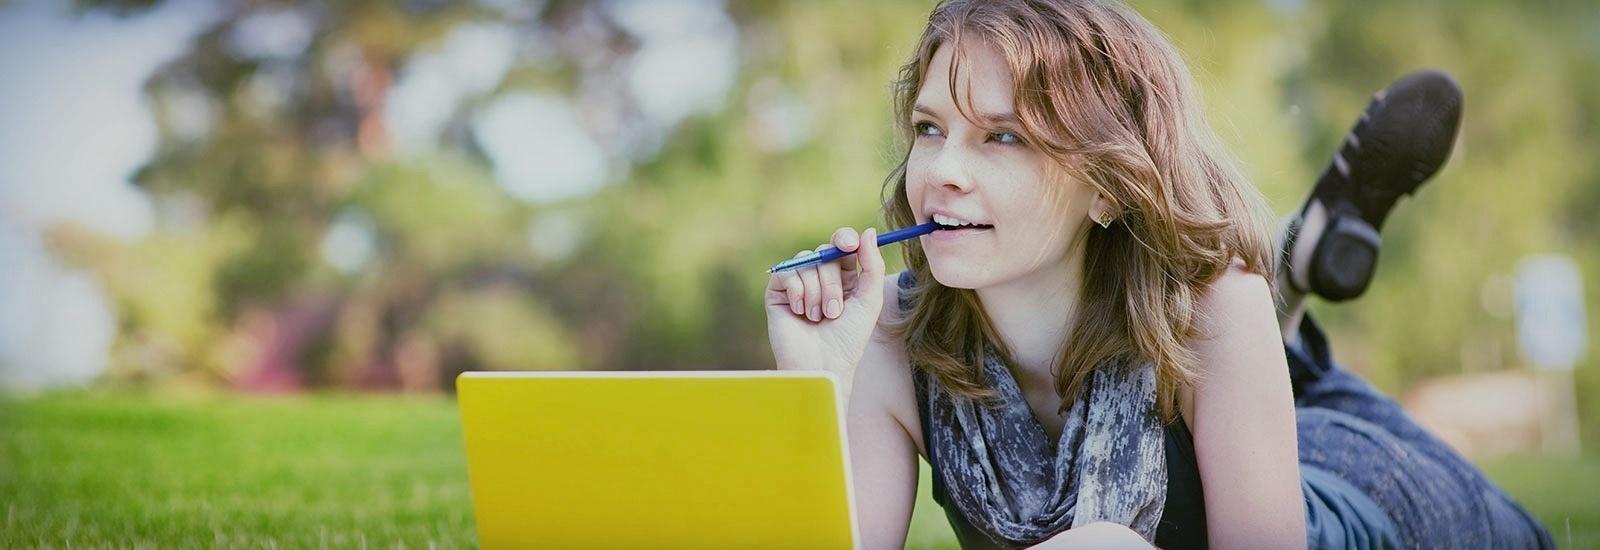 NitroCollege-Website-Title-Blog-Private-Loans-1-606208-edited-924603-edited